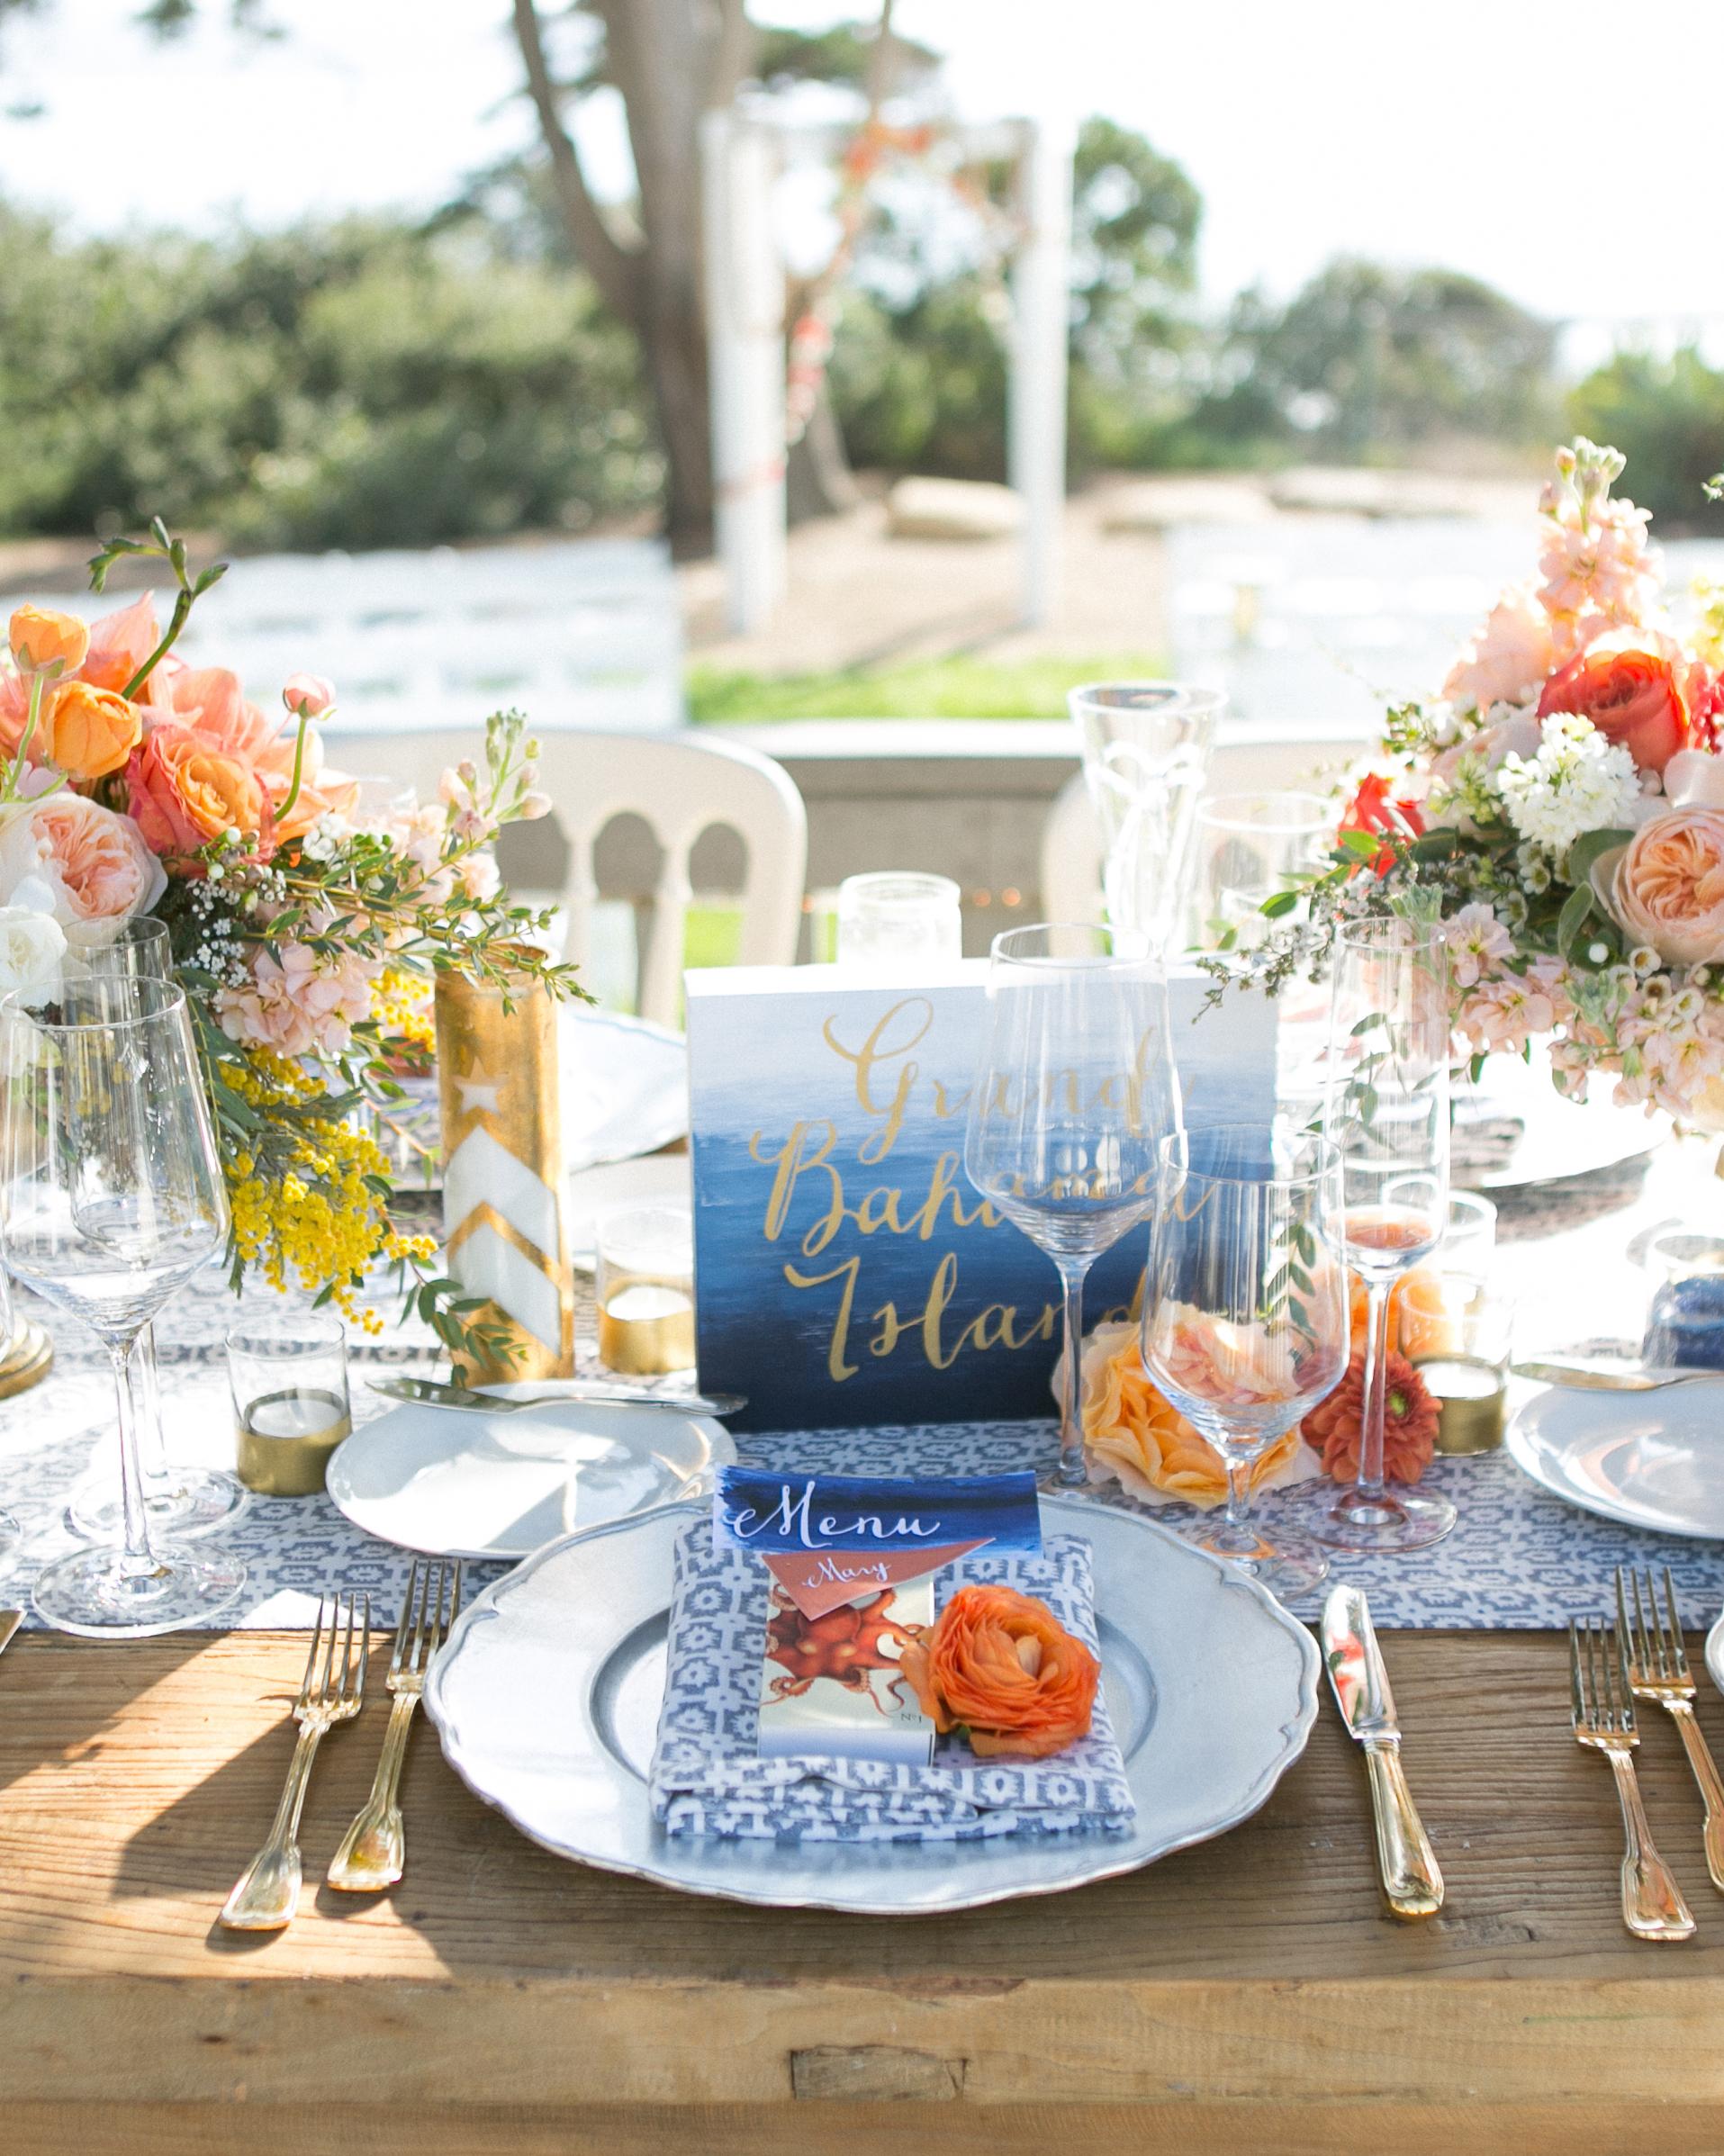 jess-clint-wedding-tabledetail-204-s111420-0814.jpg